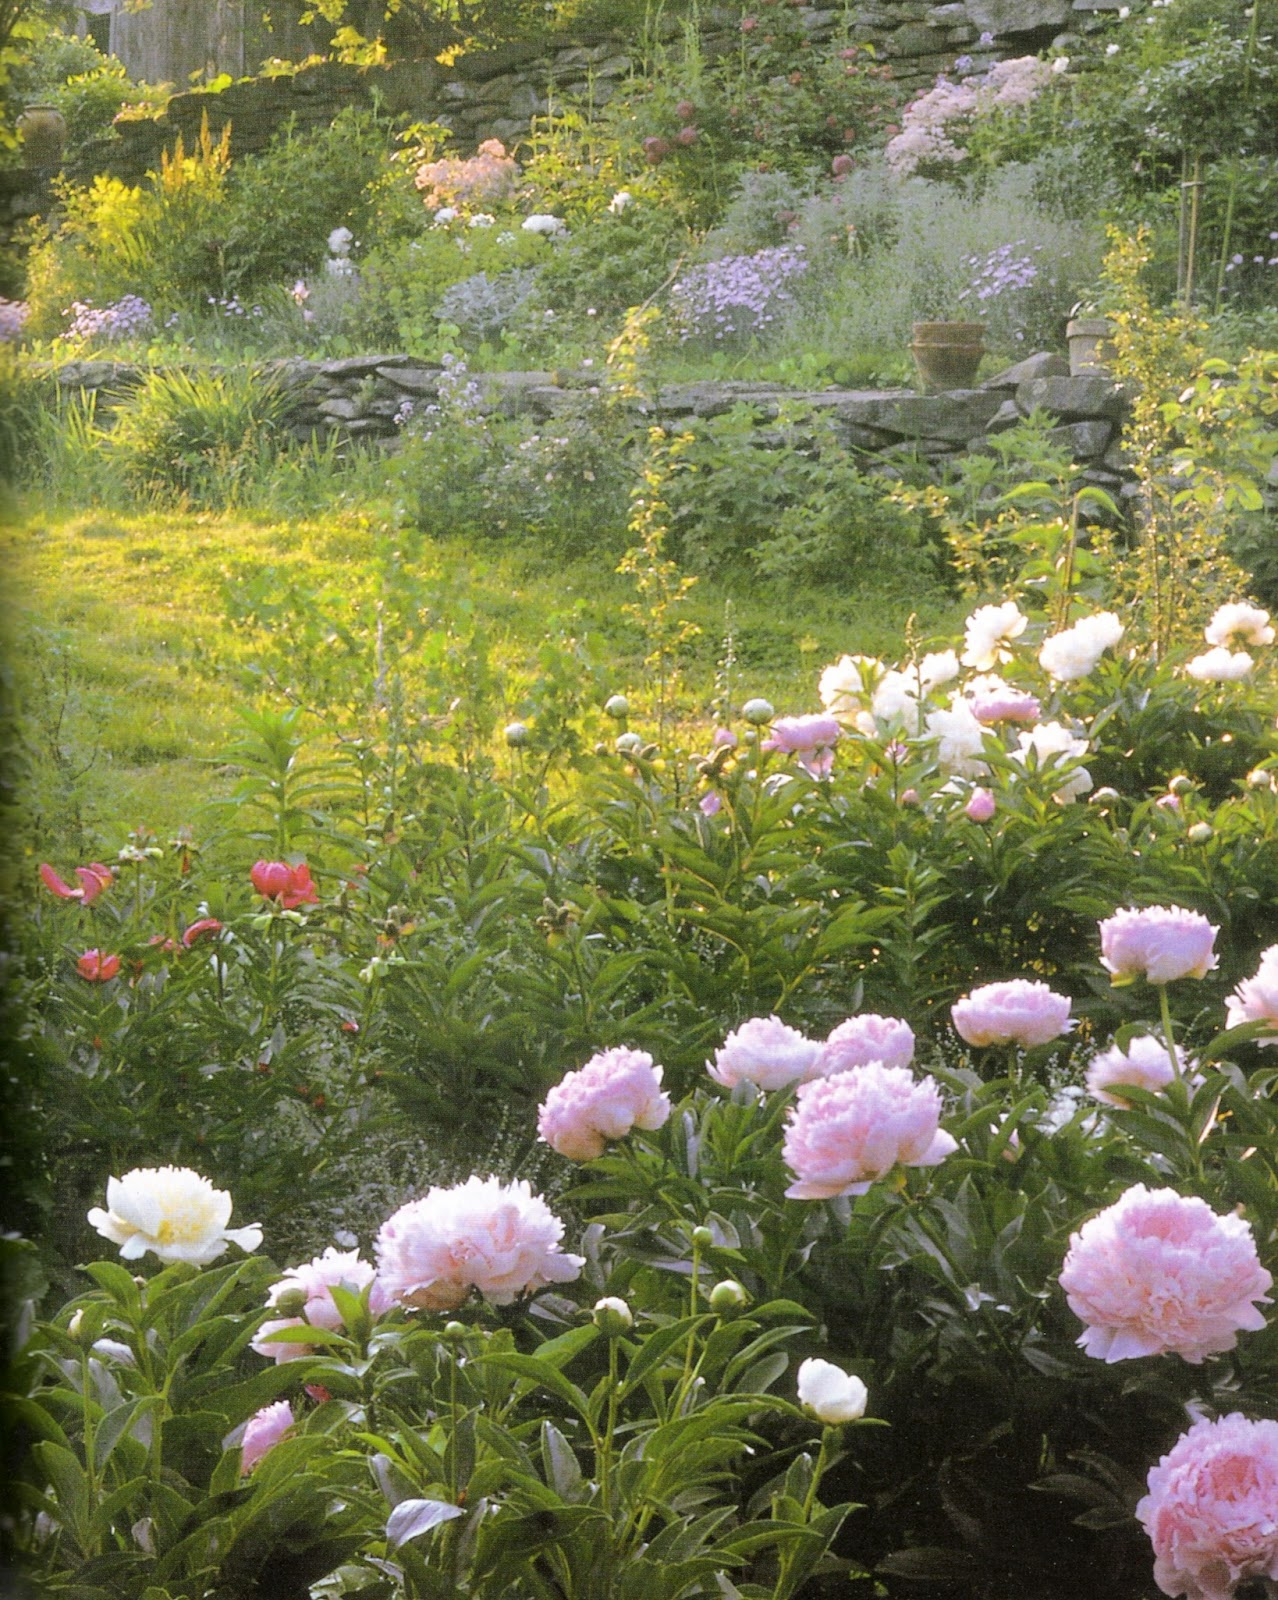 Linenandlavender Net Flowers In Profusion Tasha Tudor S Garden